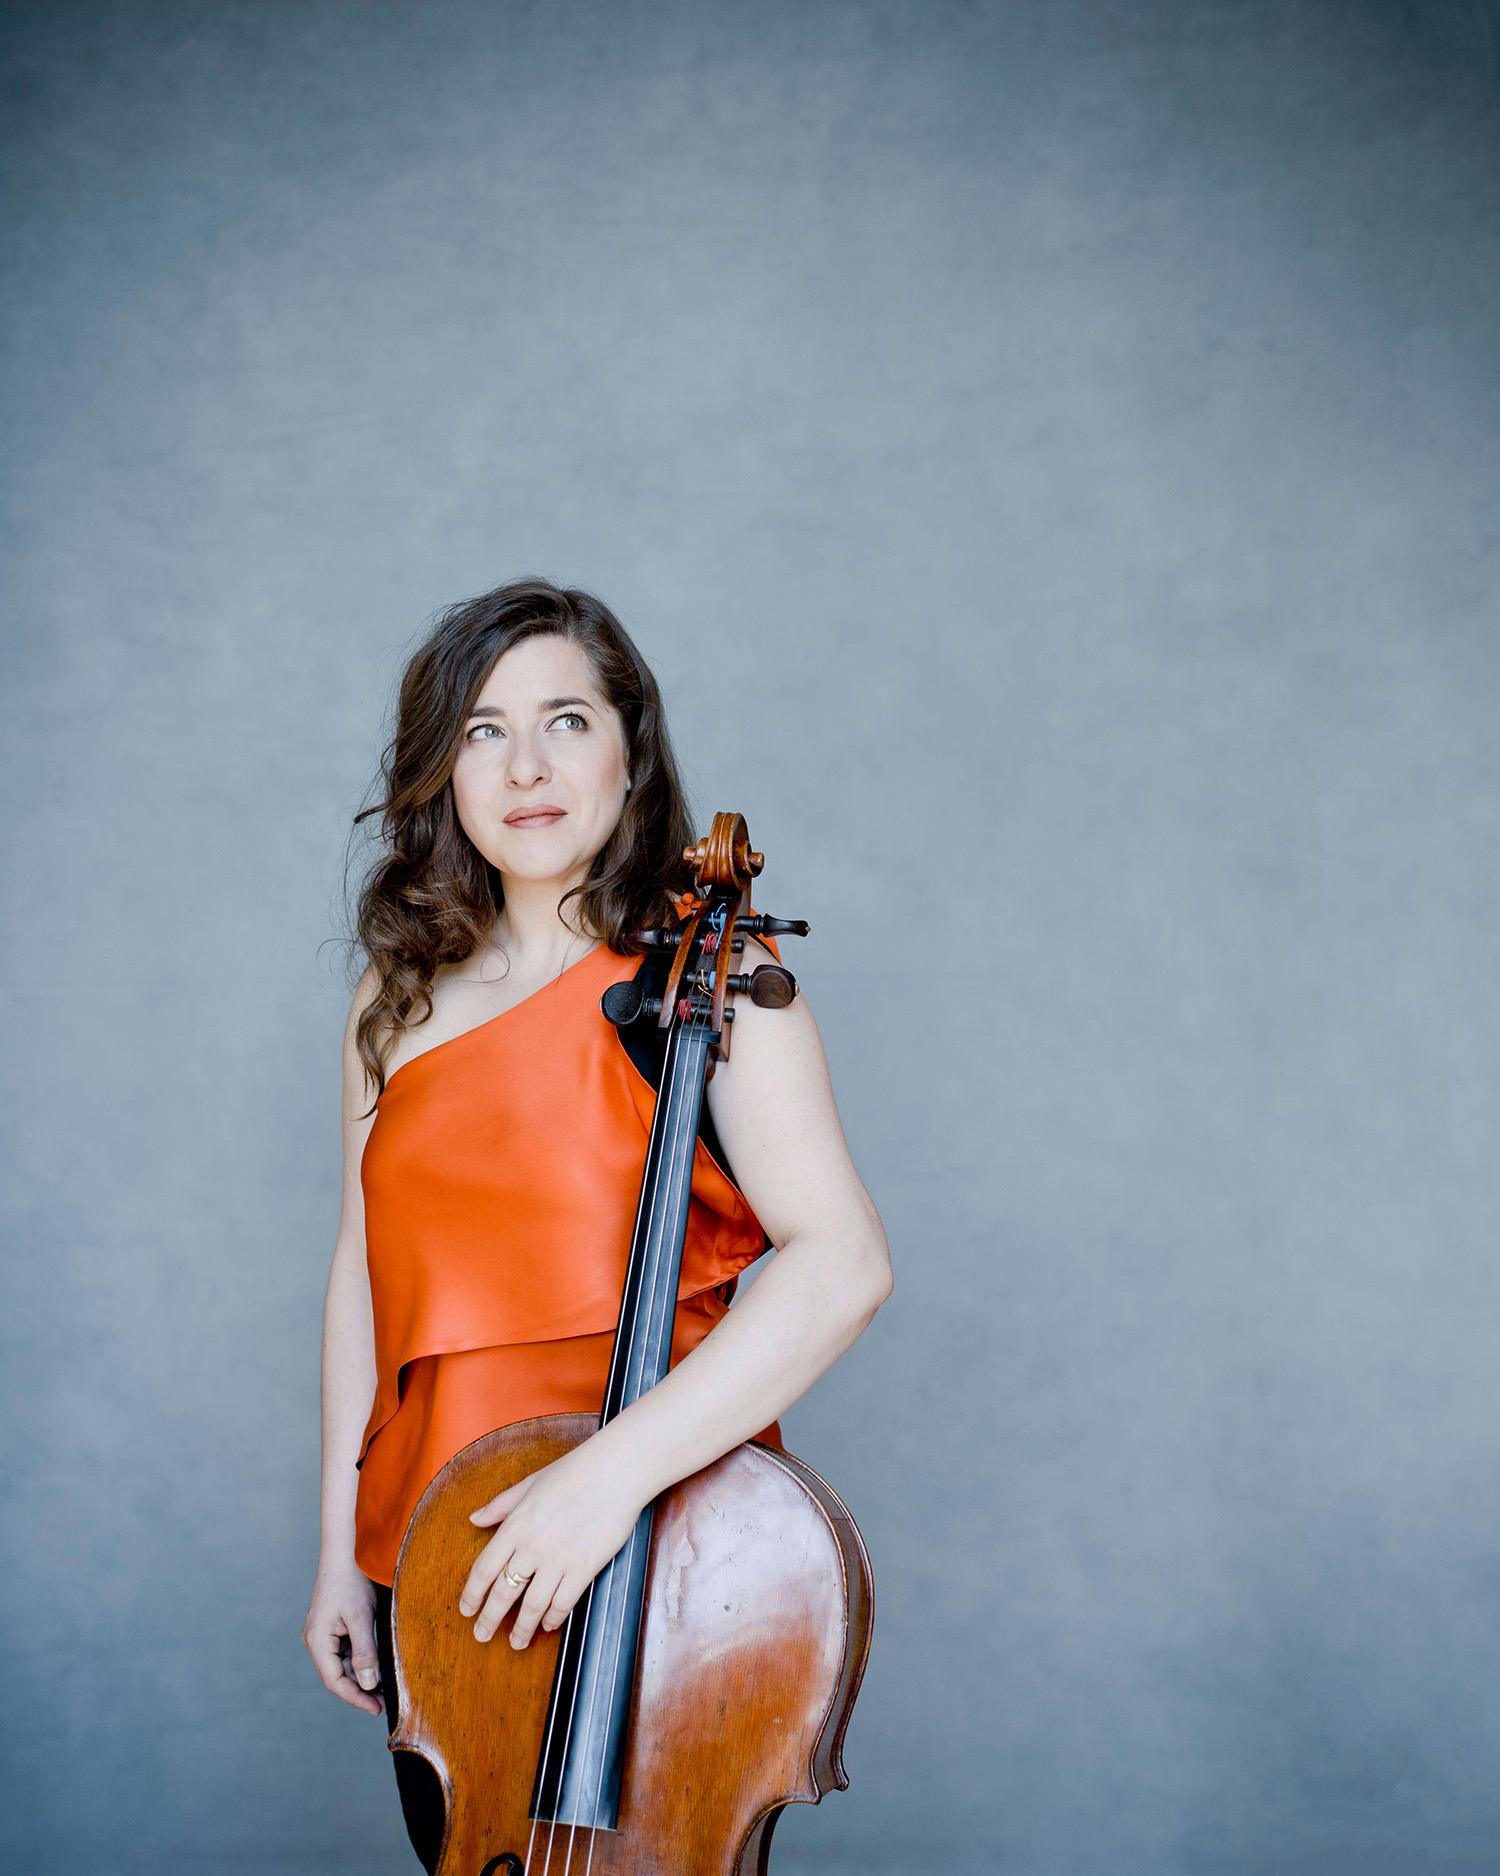 Alisa Weilerstein/Marco Borggreve